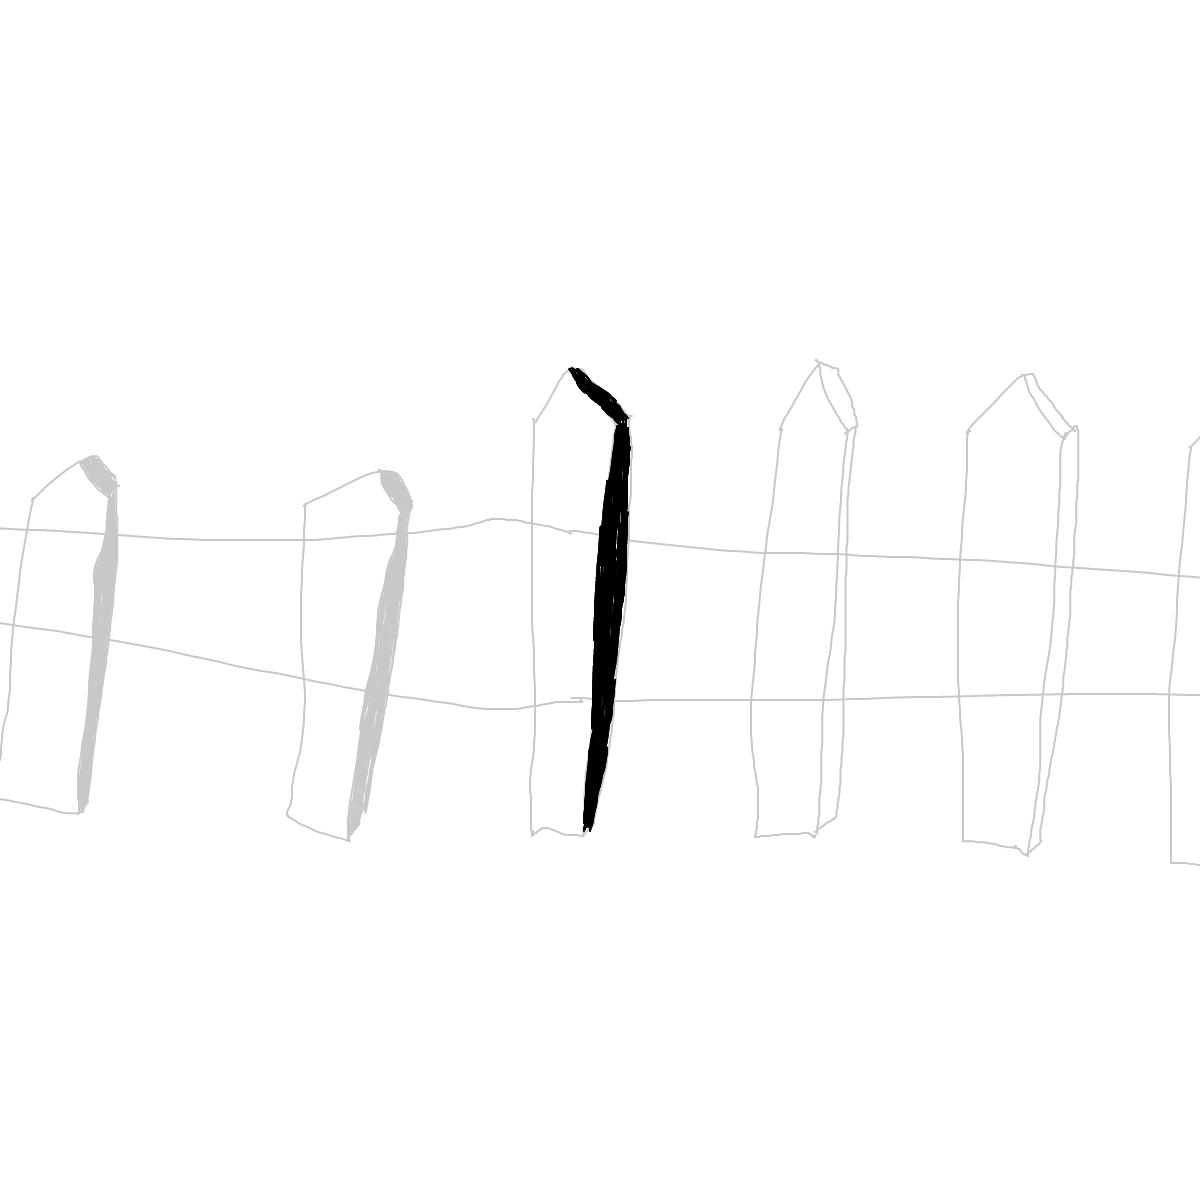 BAAAM drawing#9152 lat:52.4750595092773440lng: 13.4070386886596680